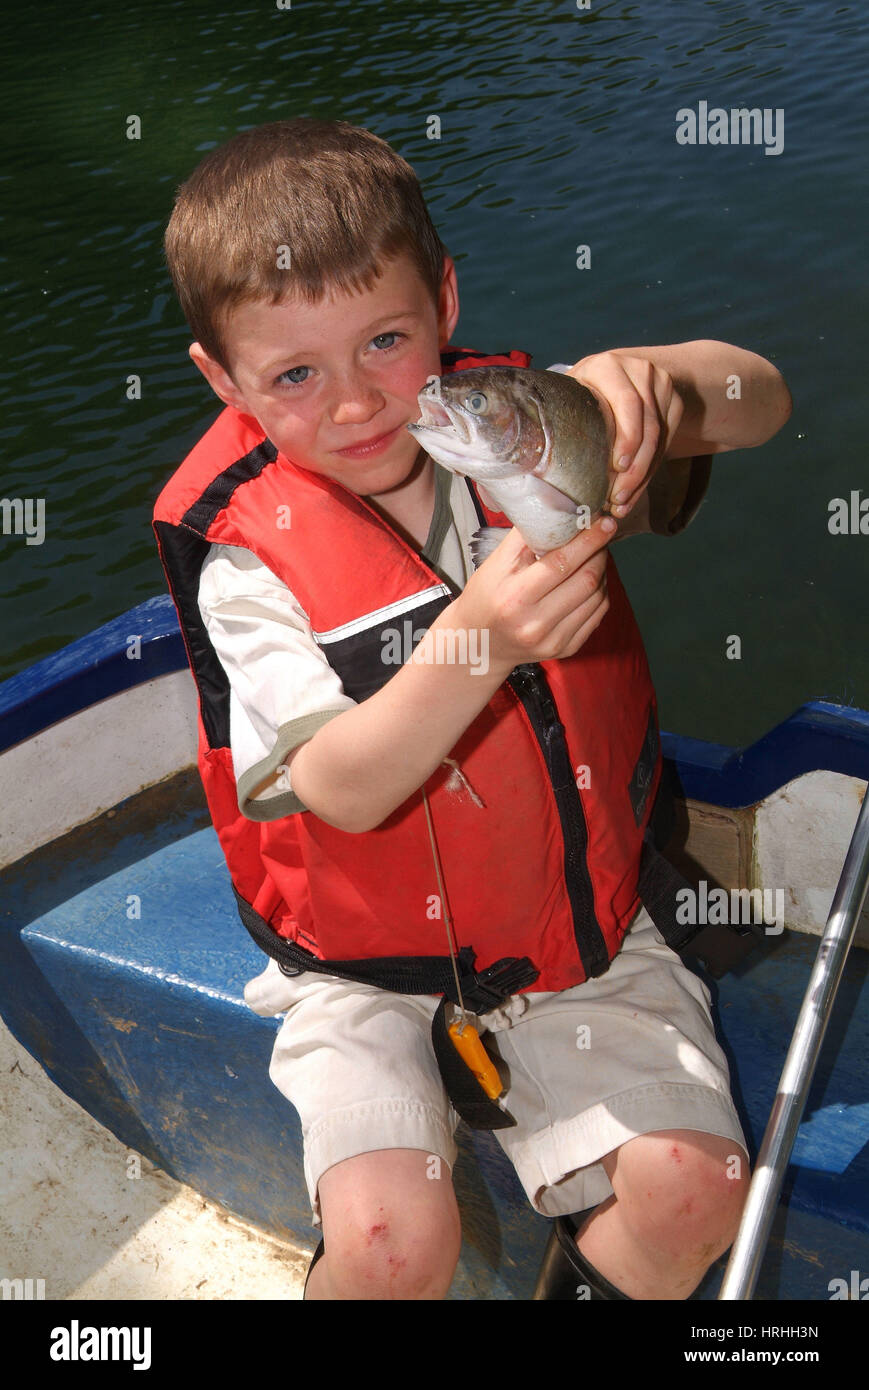 Boy Holding Fishing Line Stock Photos & Boy Holding Fishing Line ...